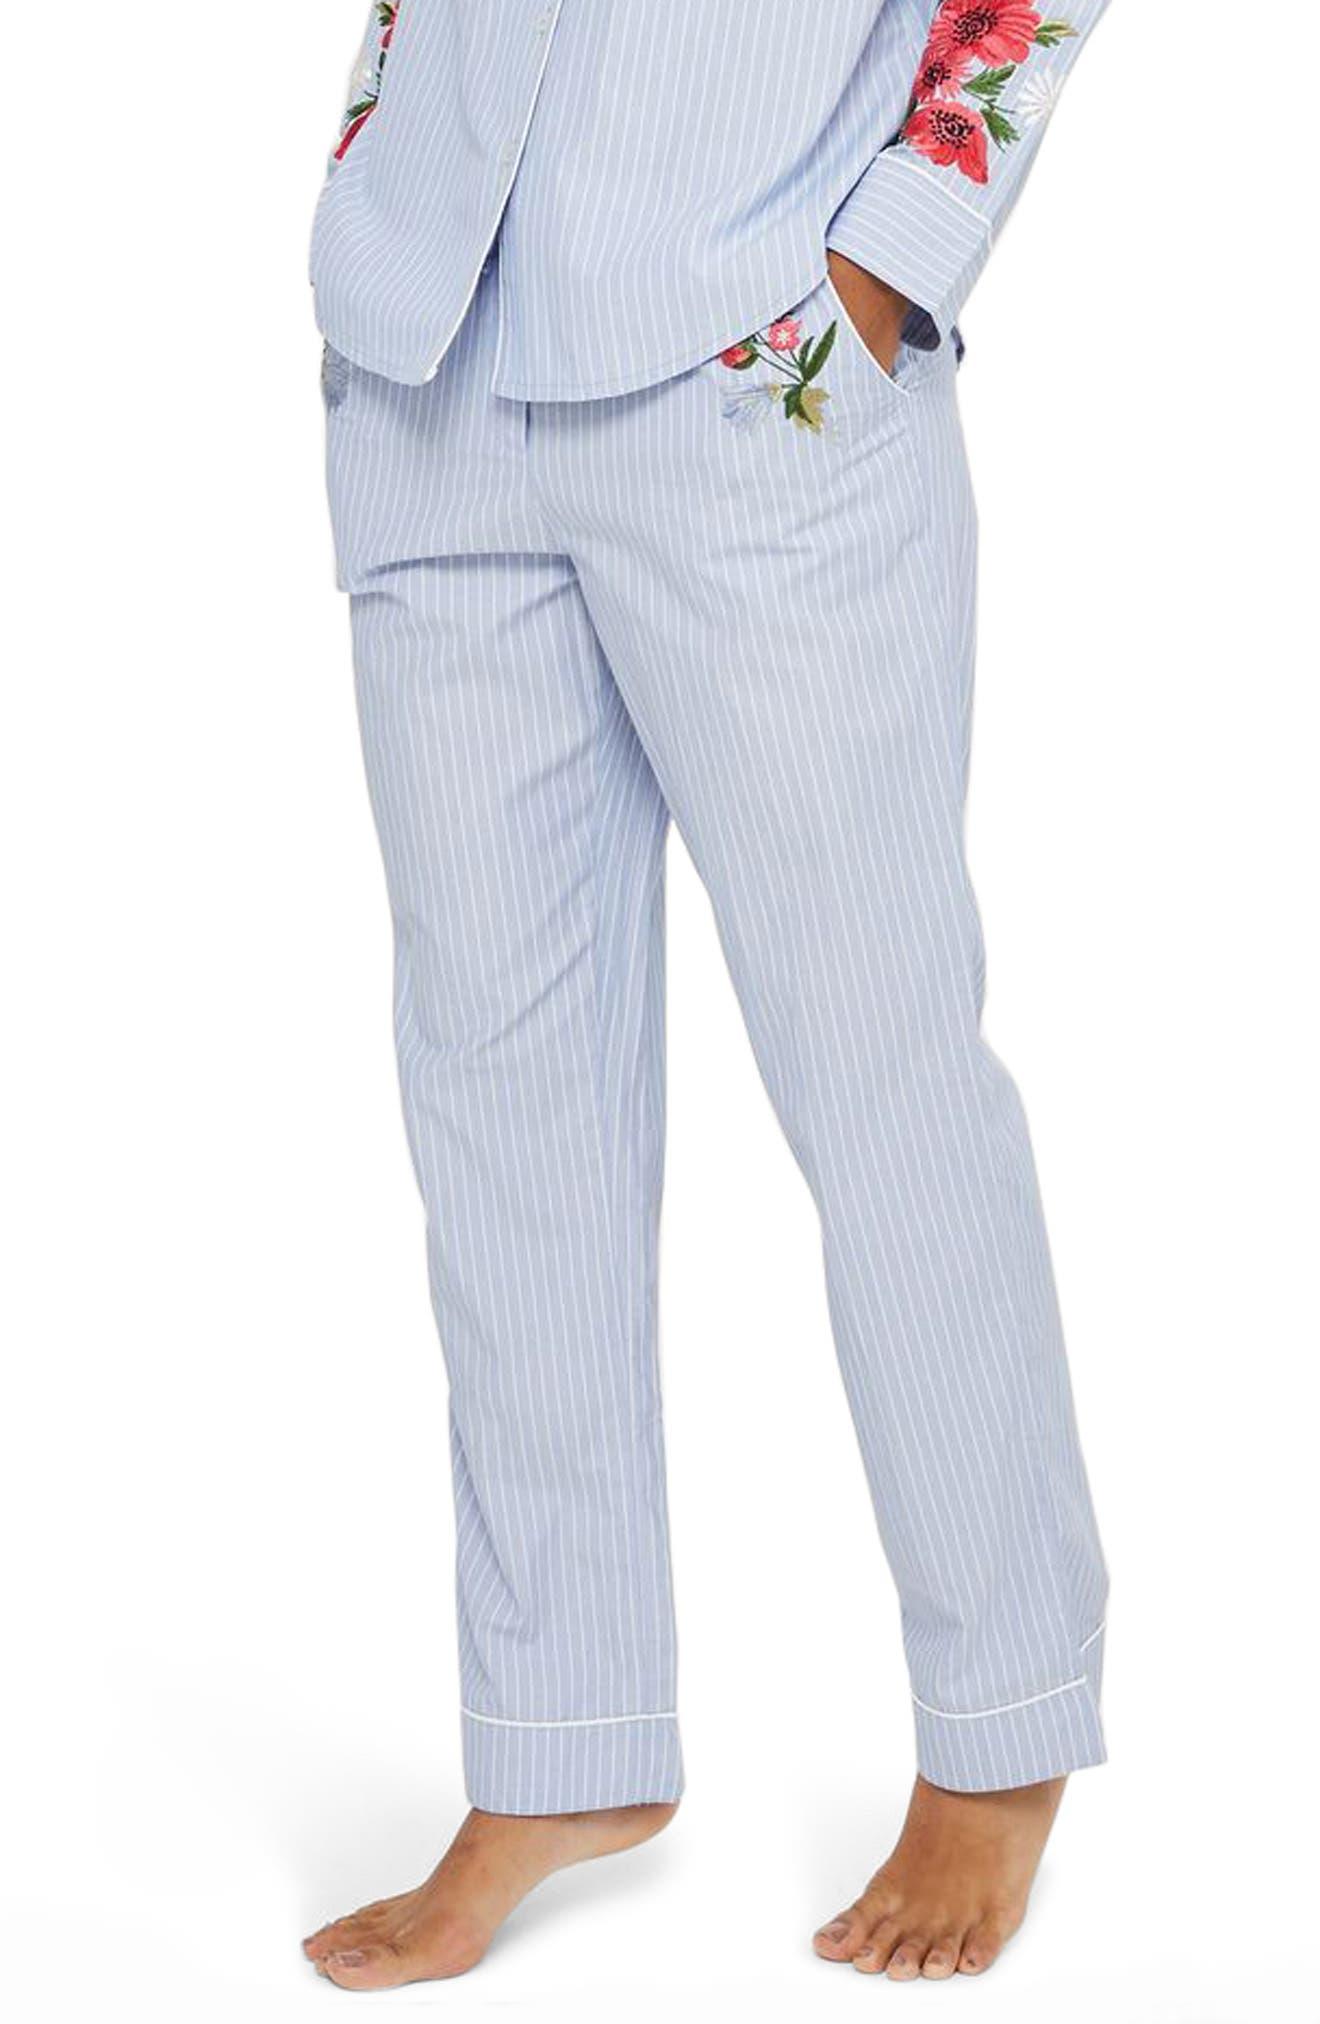 Floral Embroidered Stripe Pajama Pants,                         Main,                         color, Blue Multi